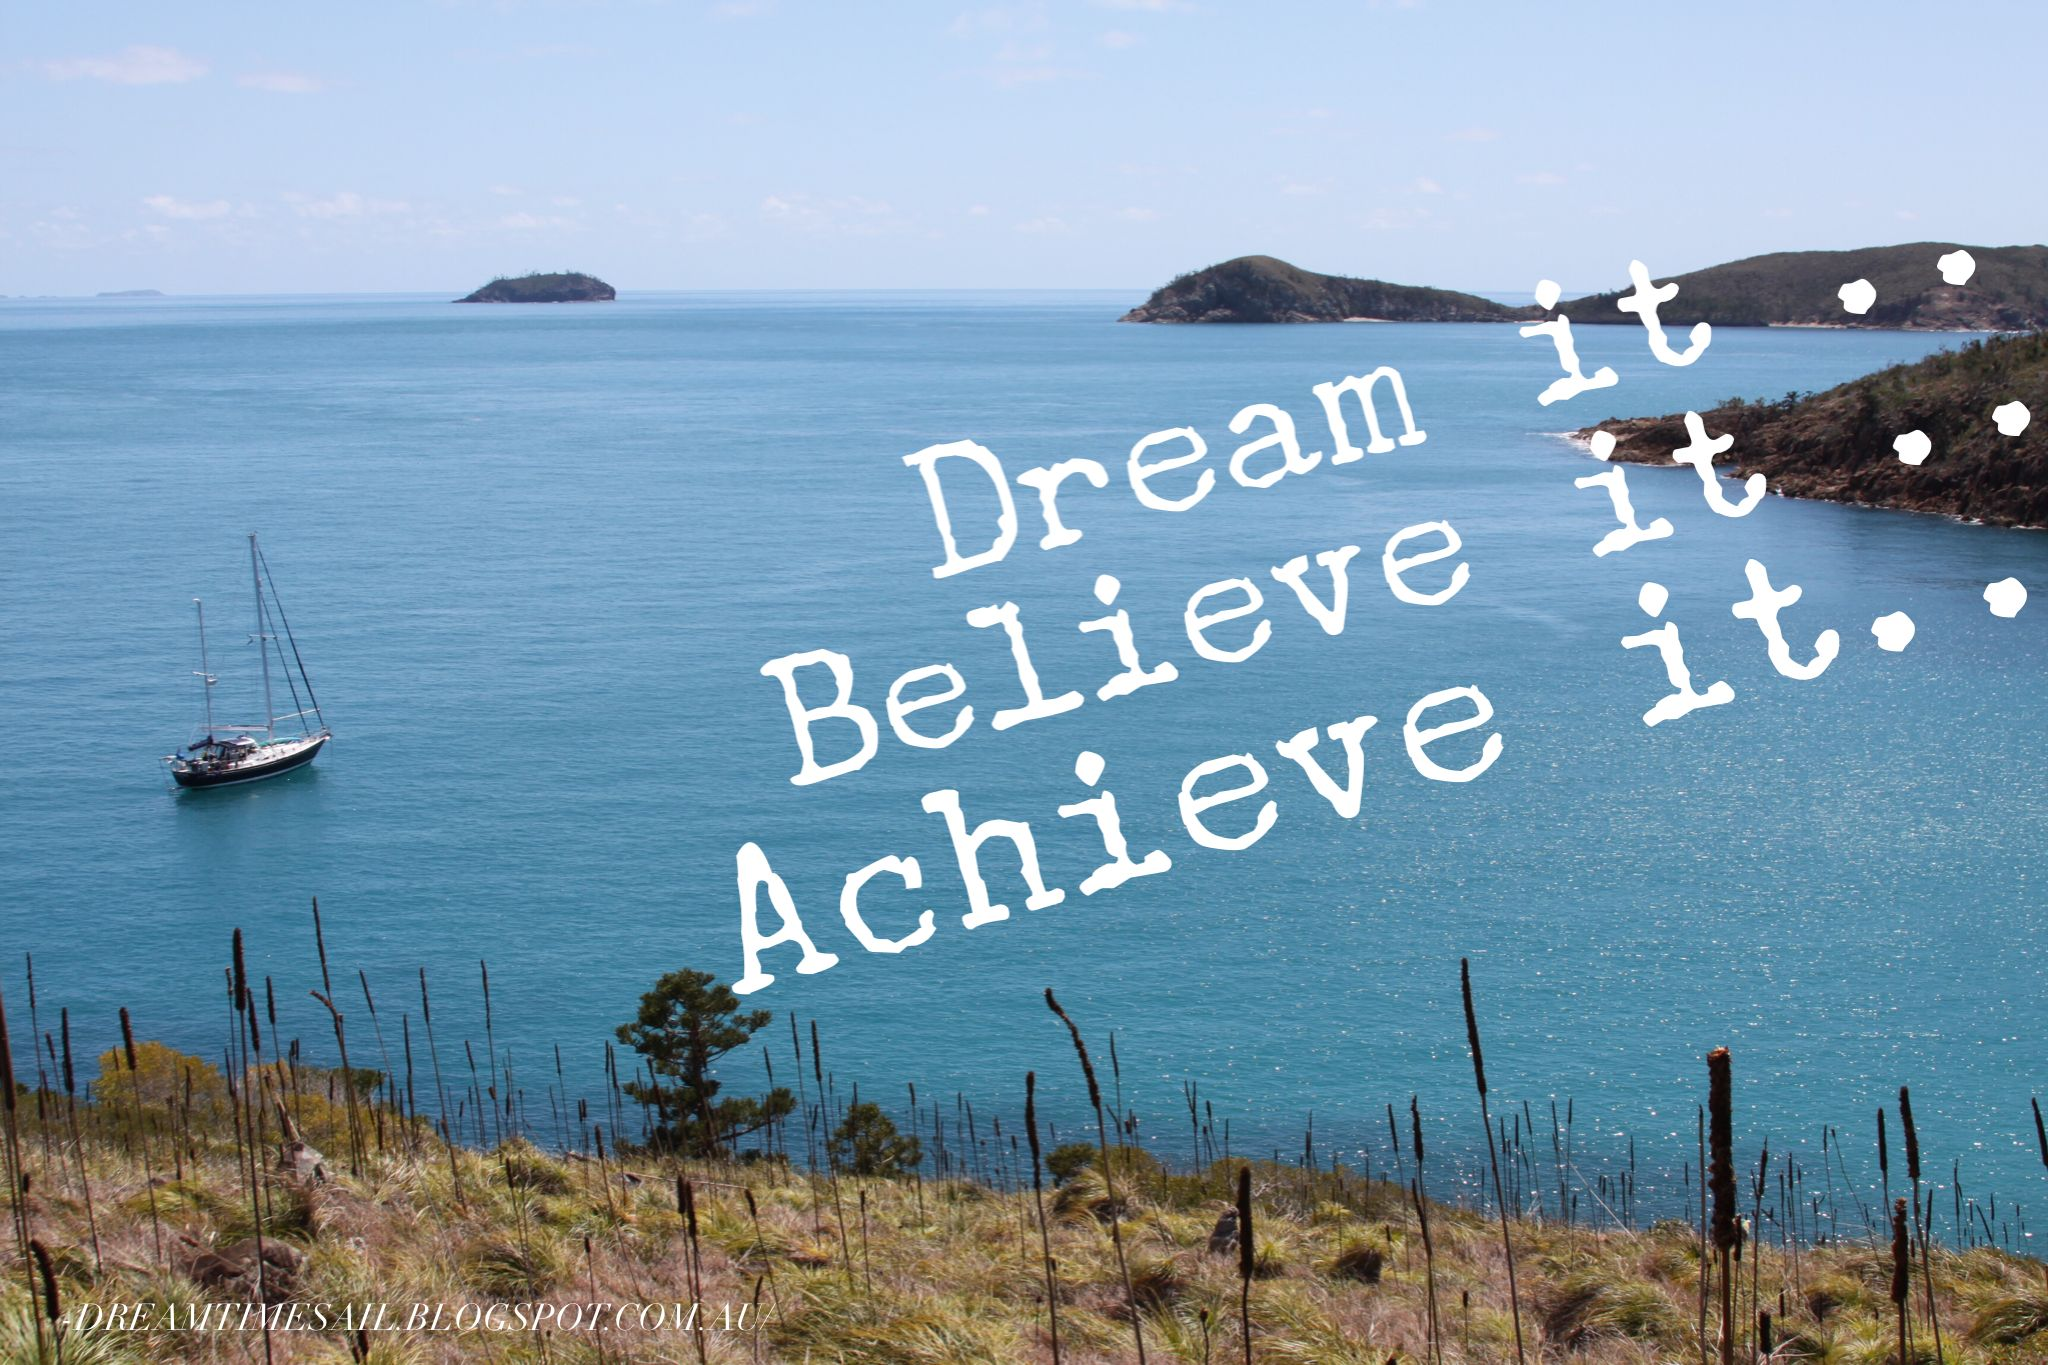 #Believeit #believe #daretodream #livingthedream #dreamtimesail #travelbysea #lifeisgood #dreambelieveachieve